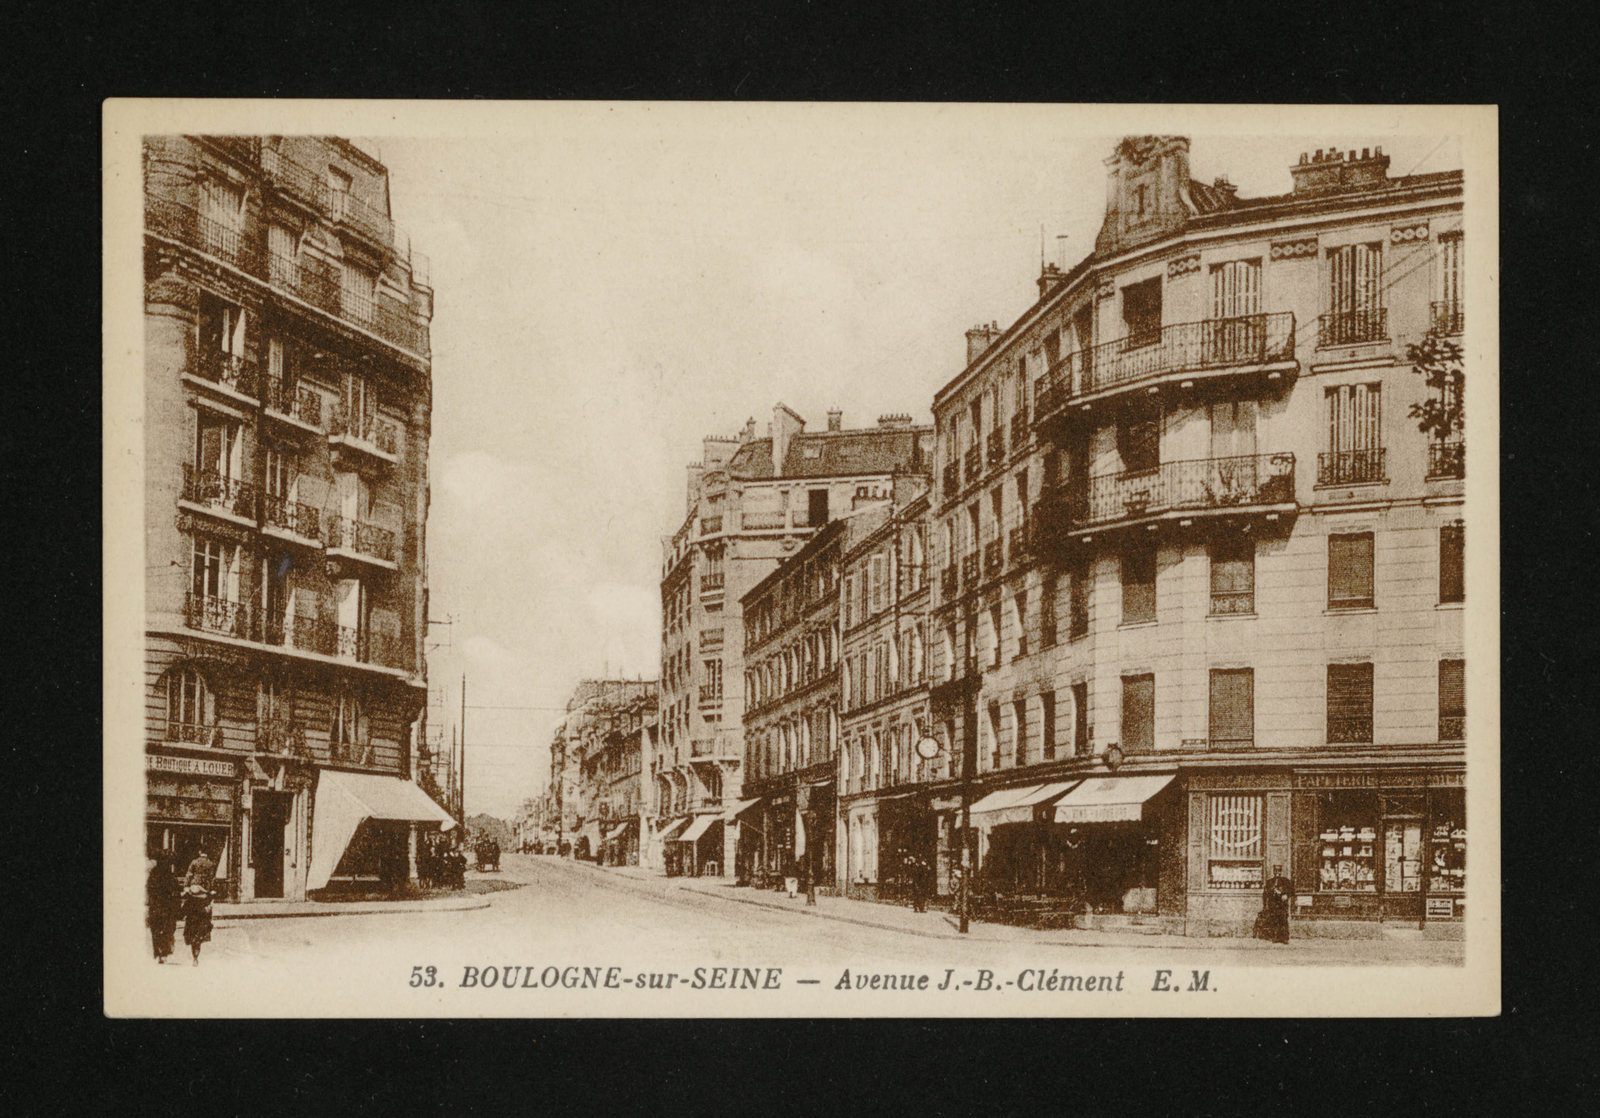 rencontre site gay georgia à Boulogne Billancourt